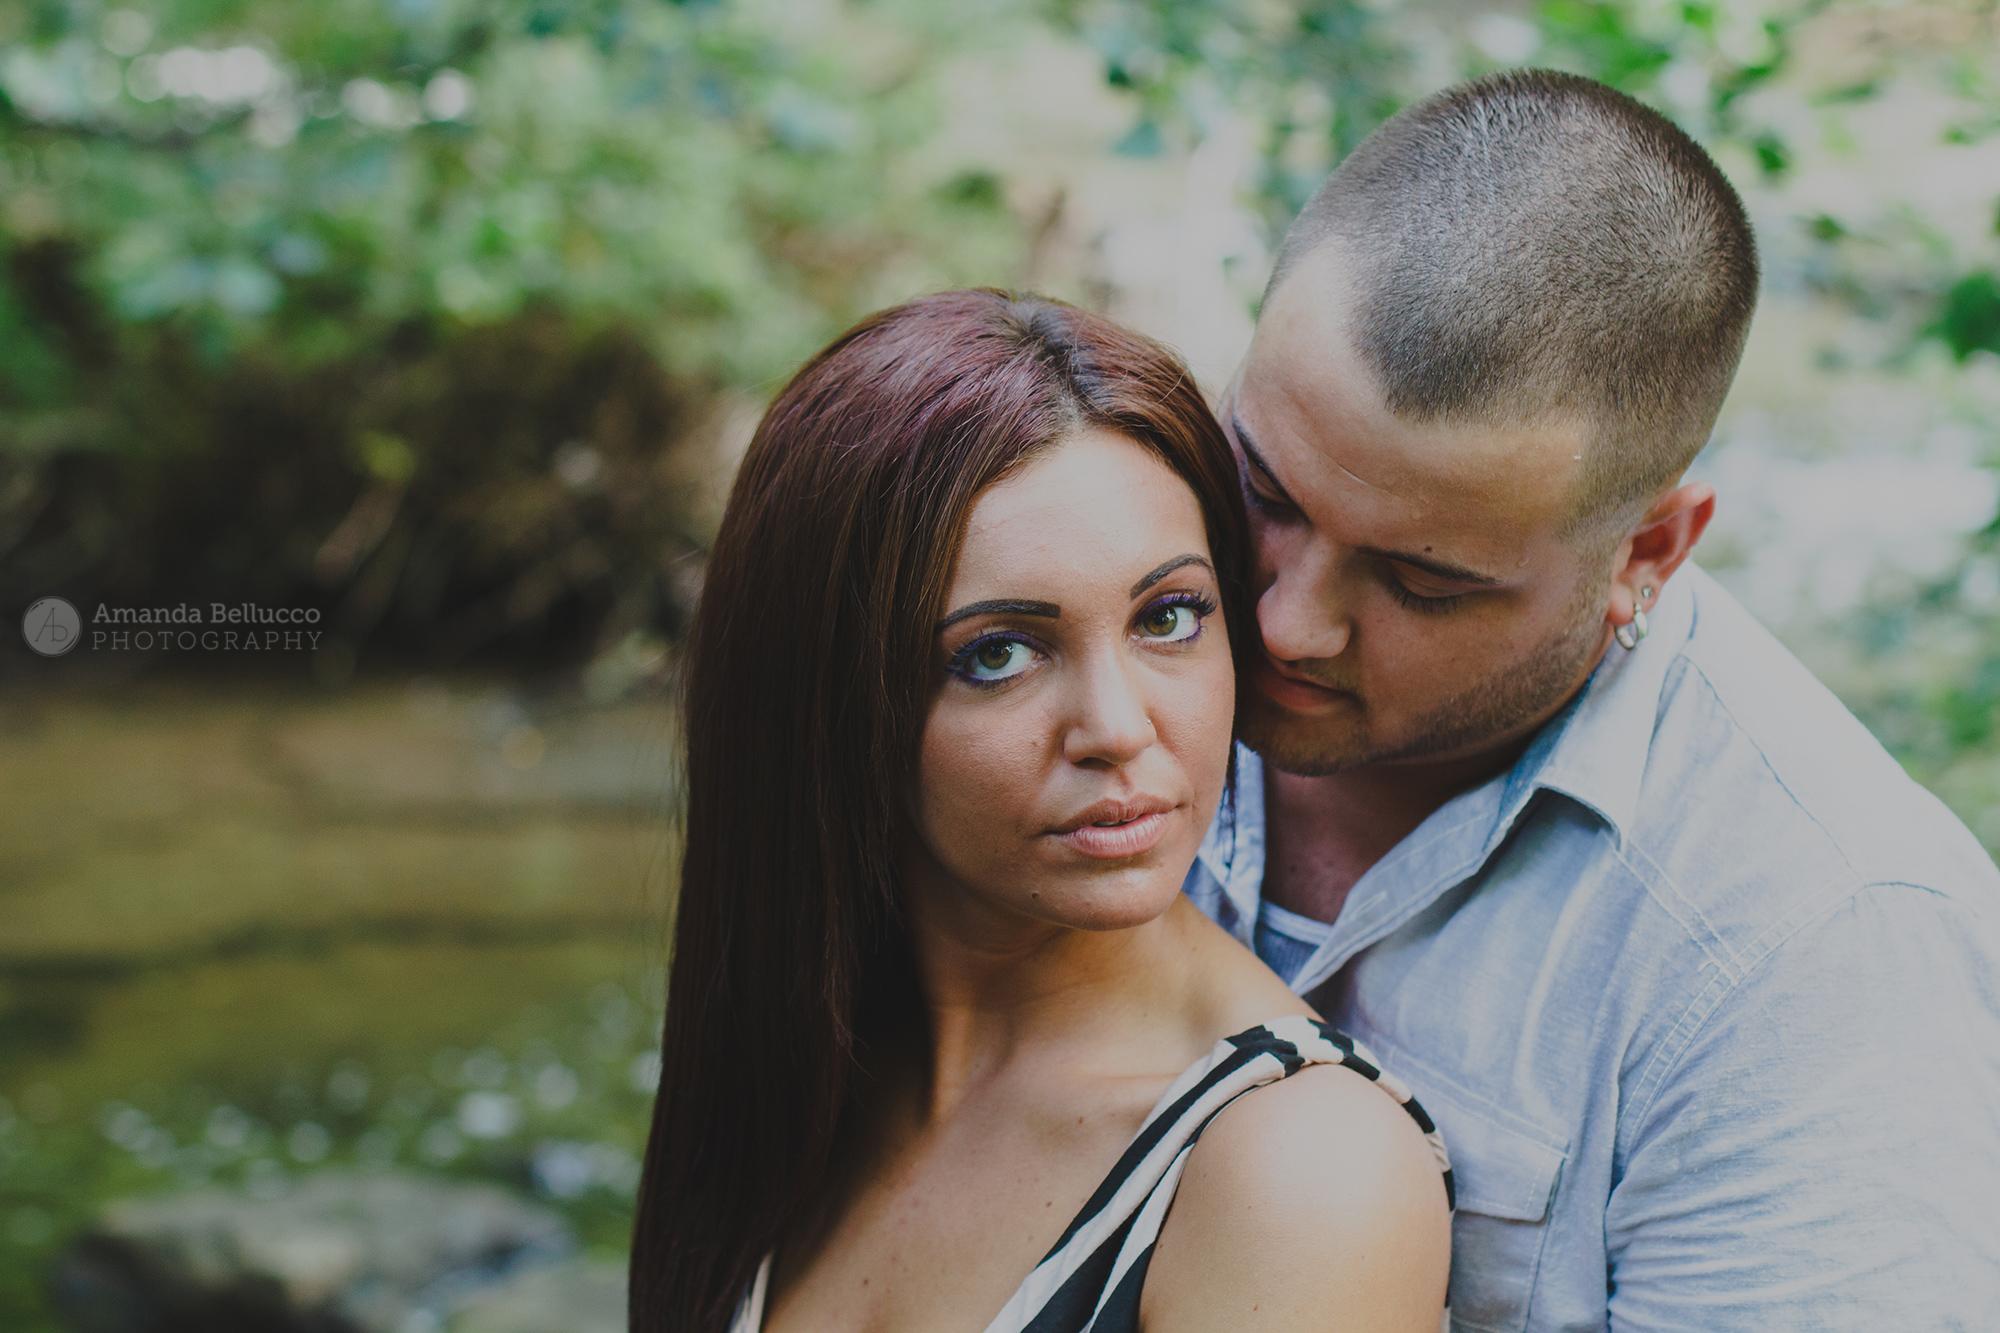 rochester_ny_engagement_wedding_photographer_4.jpg